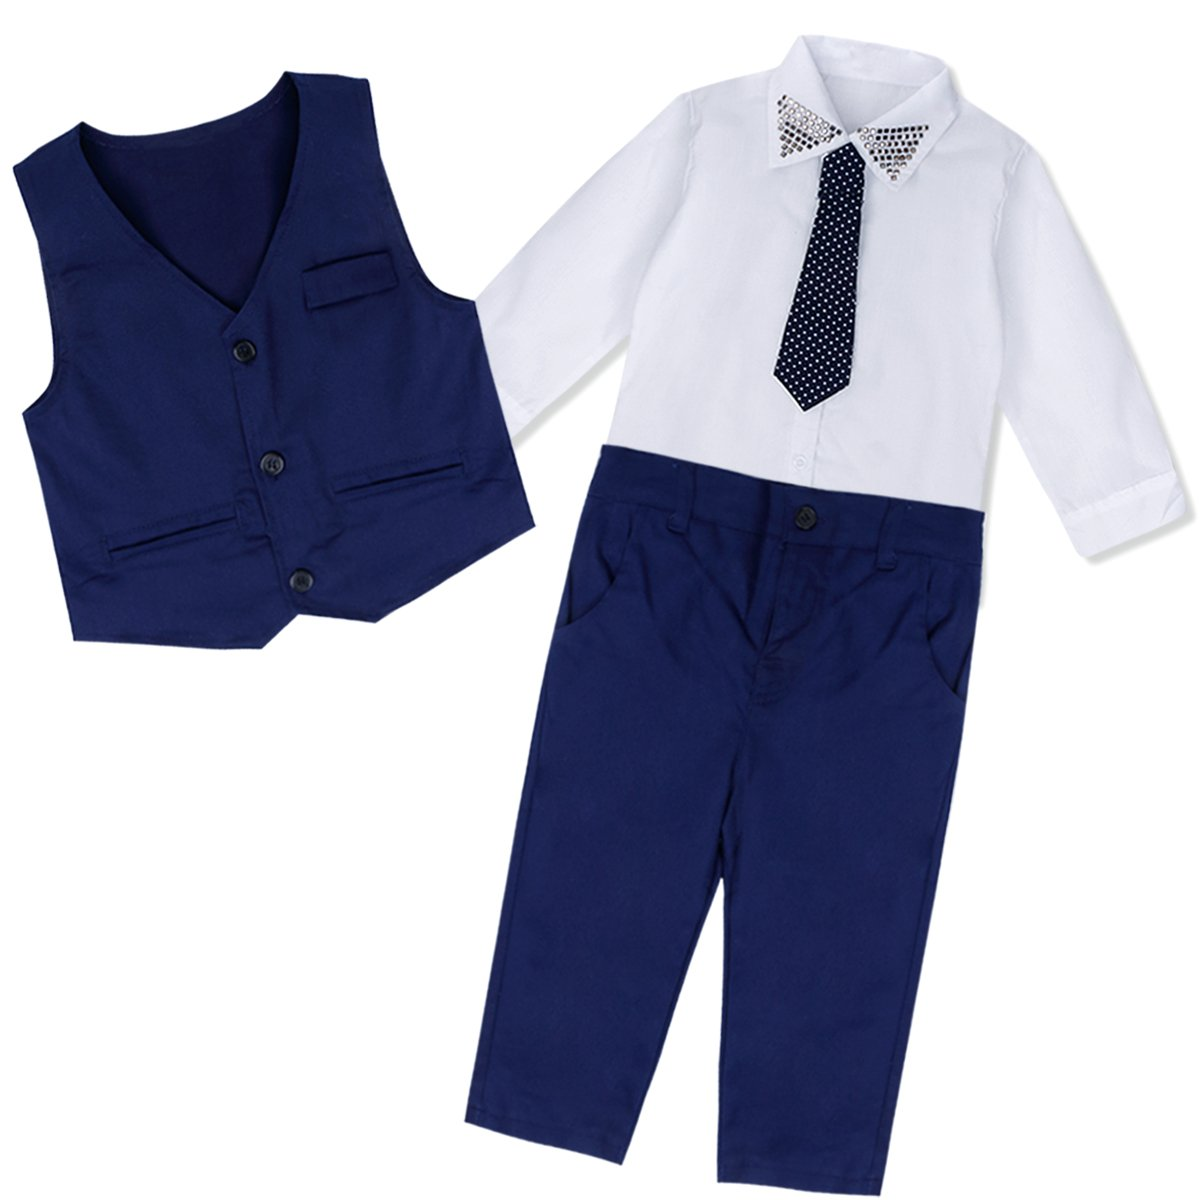 Freebily Baby Boy Wedding Formal Suit Bowtie Gentleman T-Shirt Waistcoat Tuxedo Outfits White&Blue 4